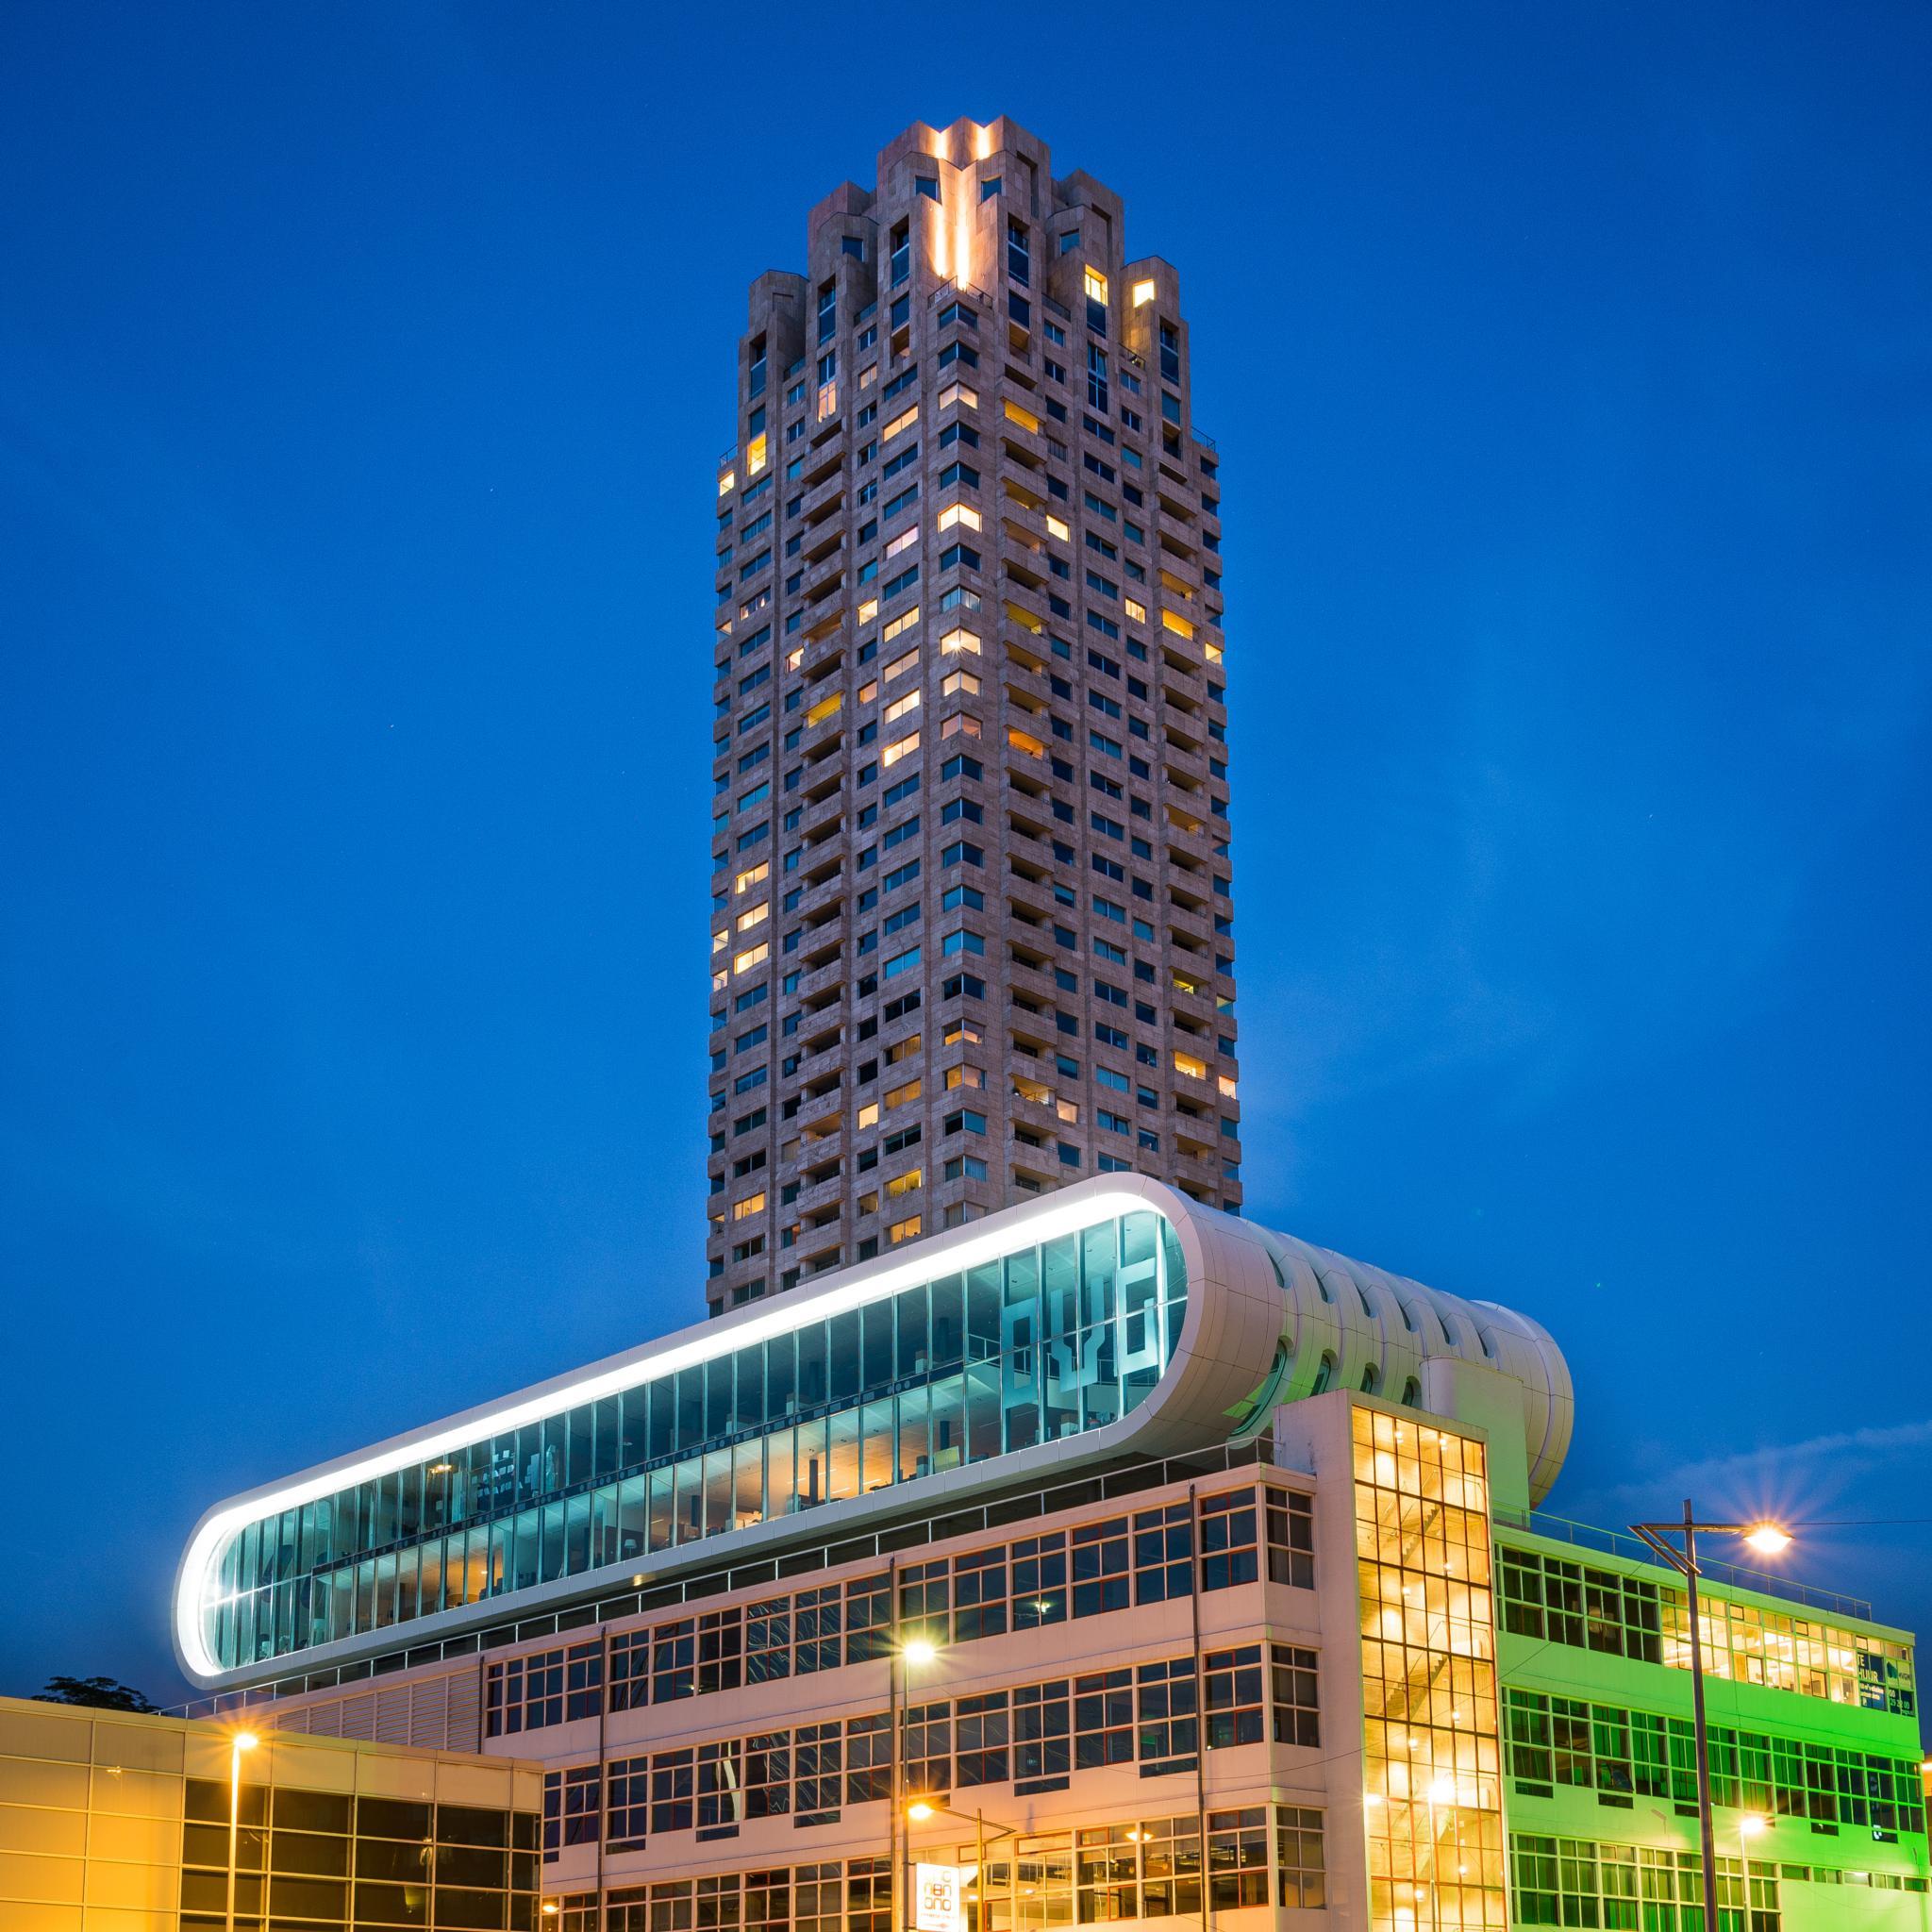 Evening building by oskarn74